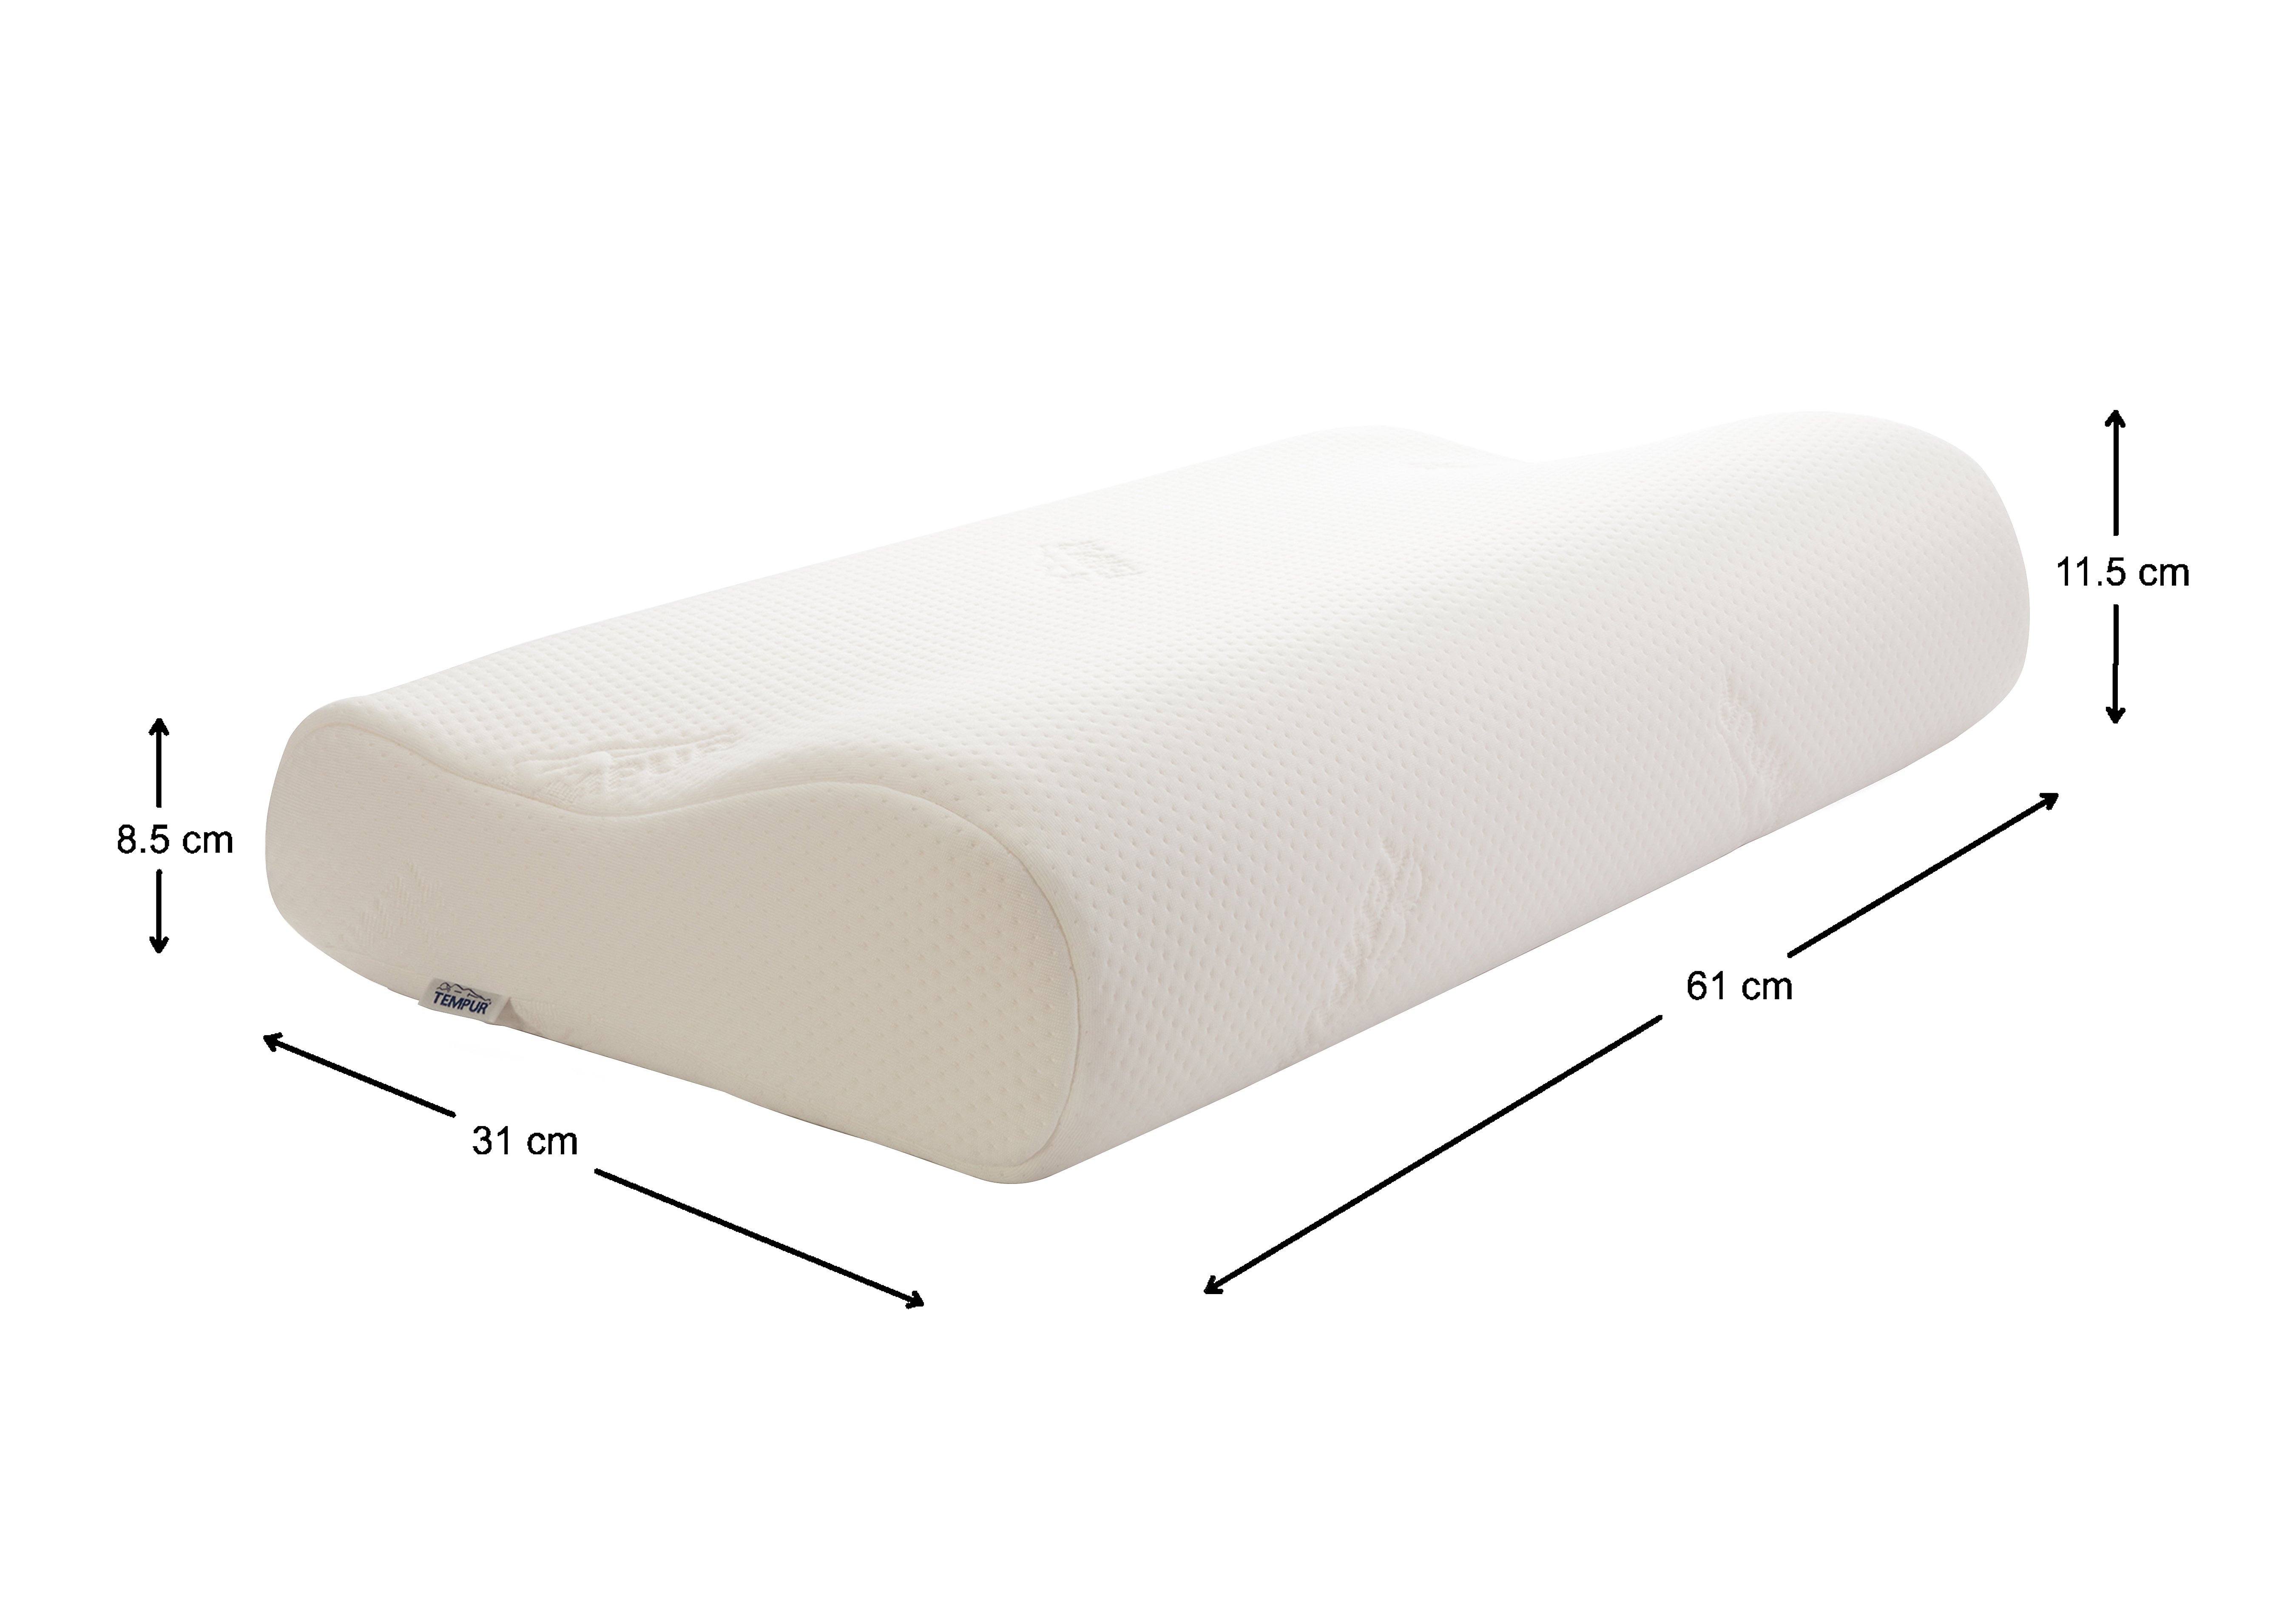 Comfort Pillow Original Large in  on Furniture Village